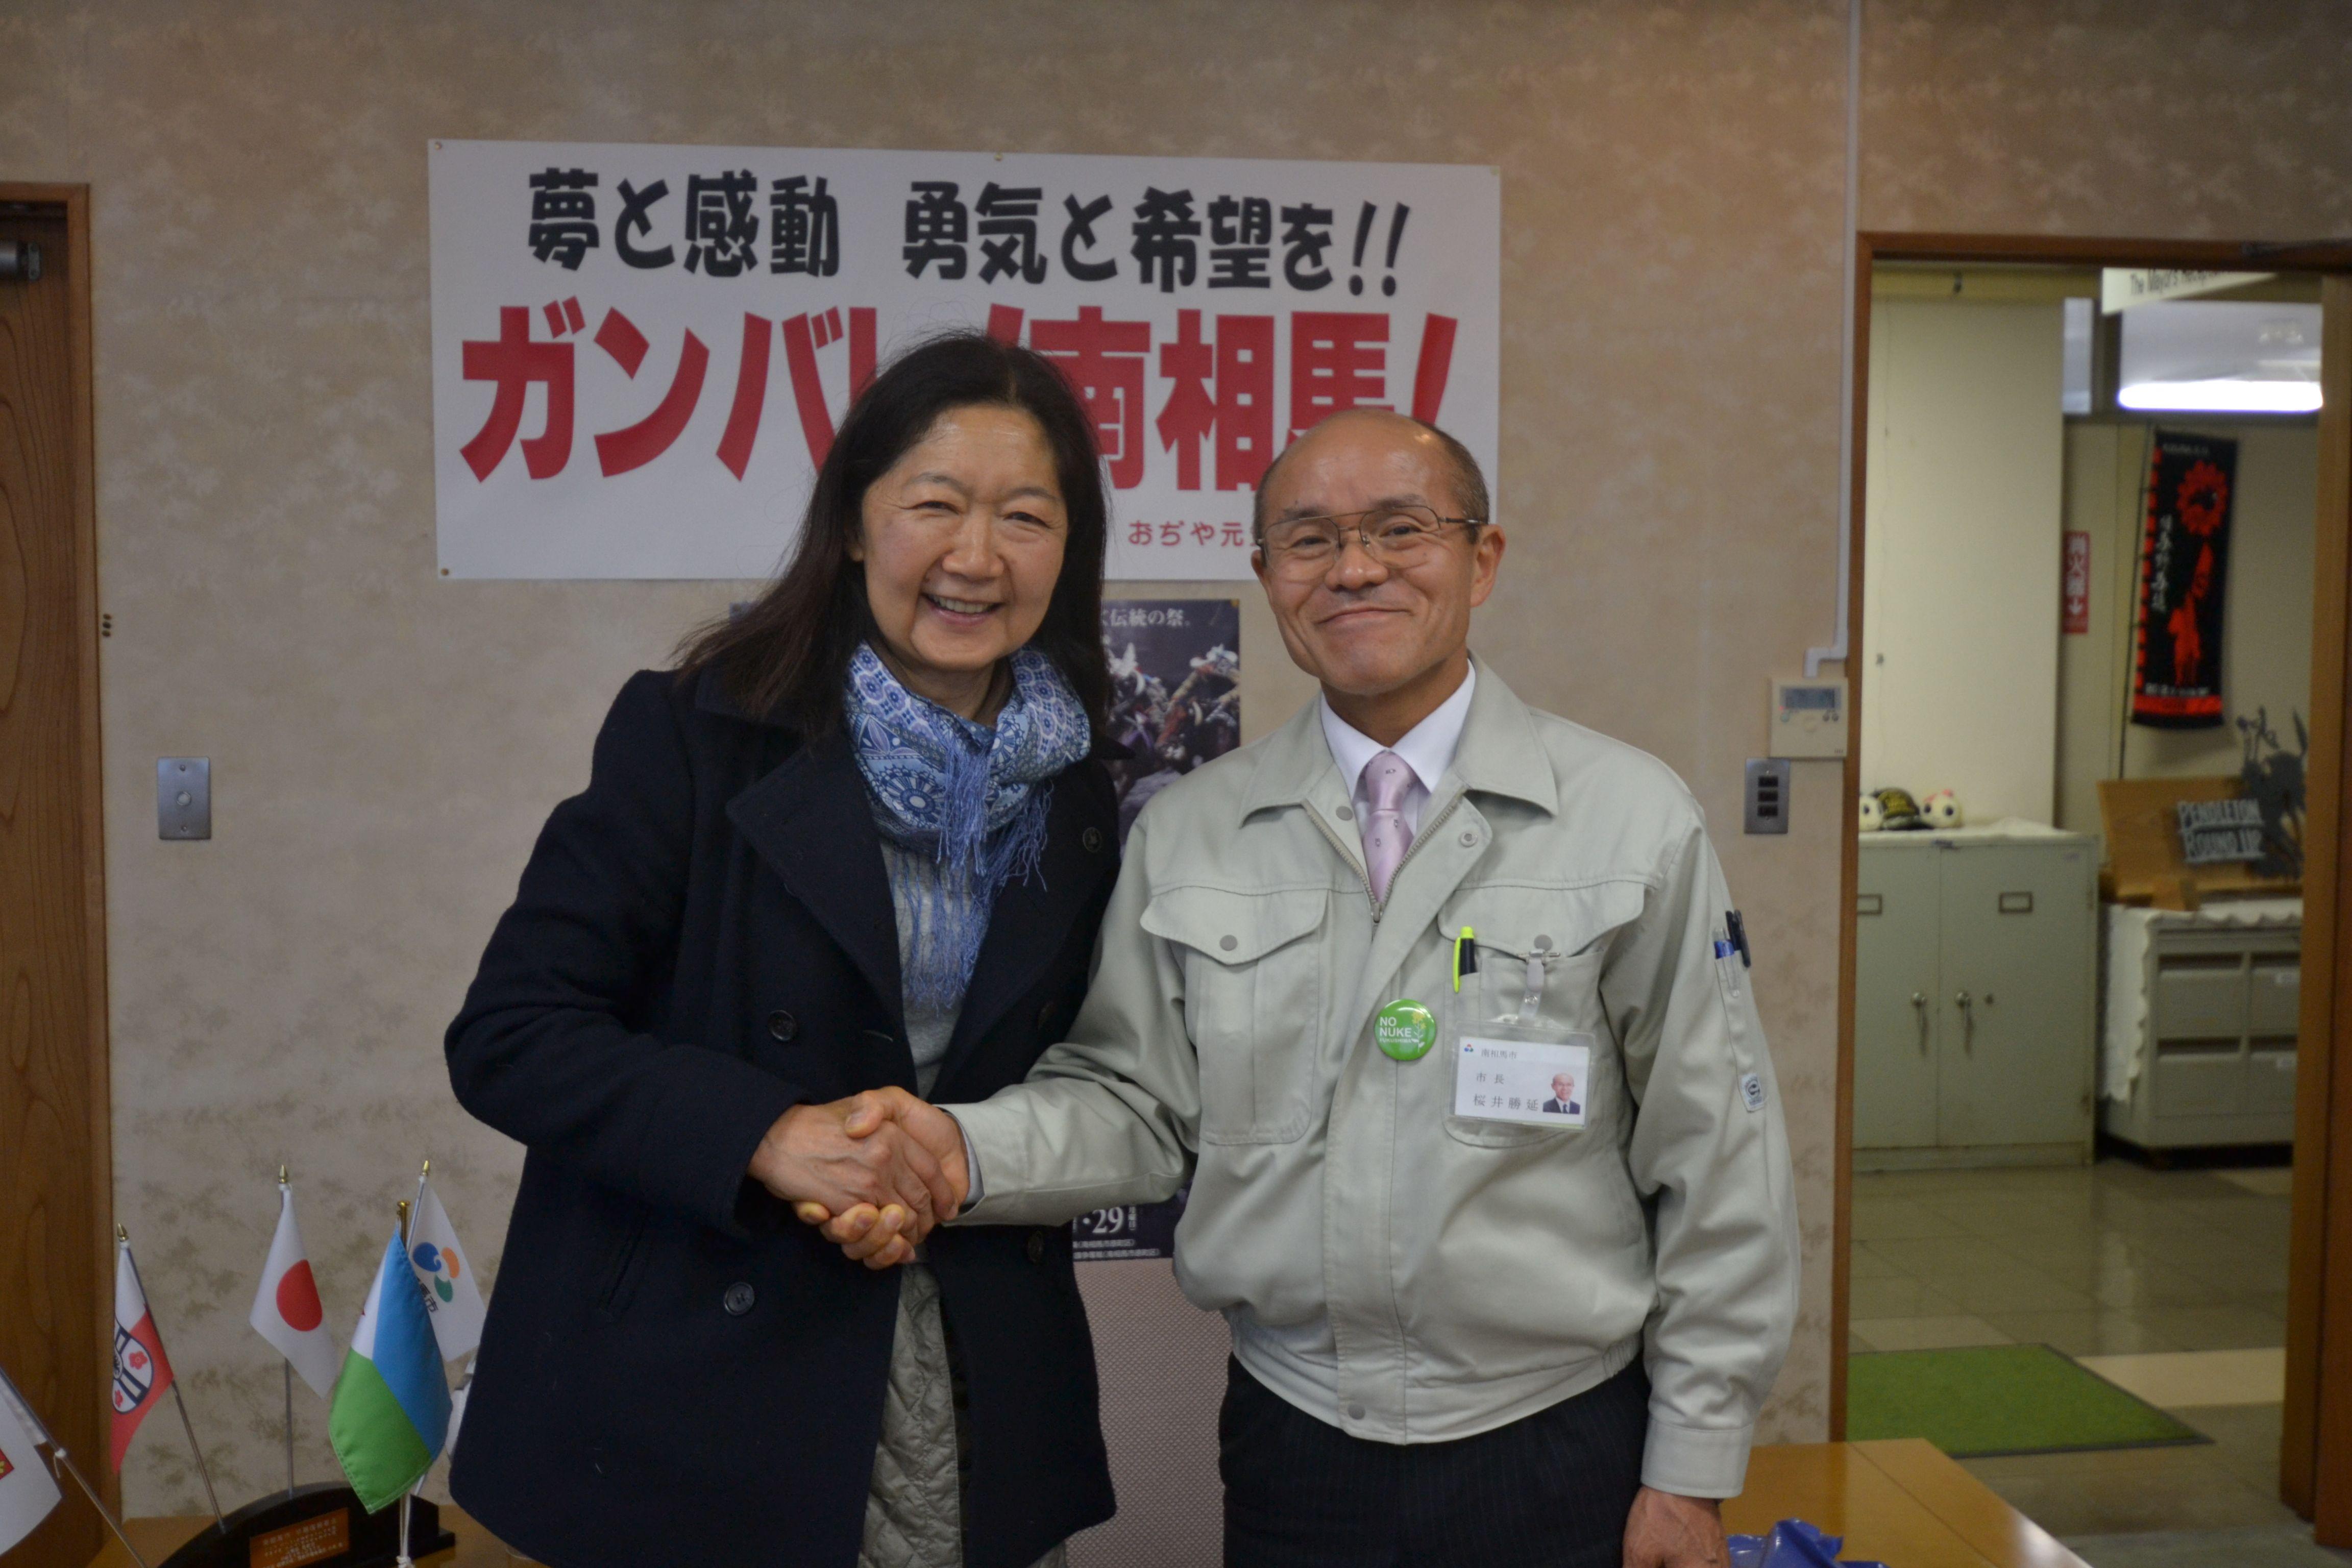 minamisoma mayor sakurai shakes hand with linda.jpg